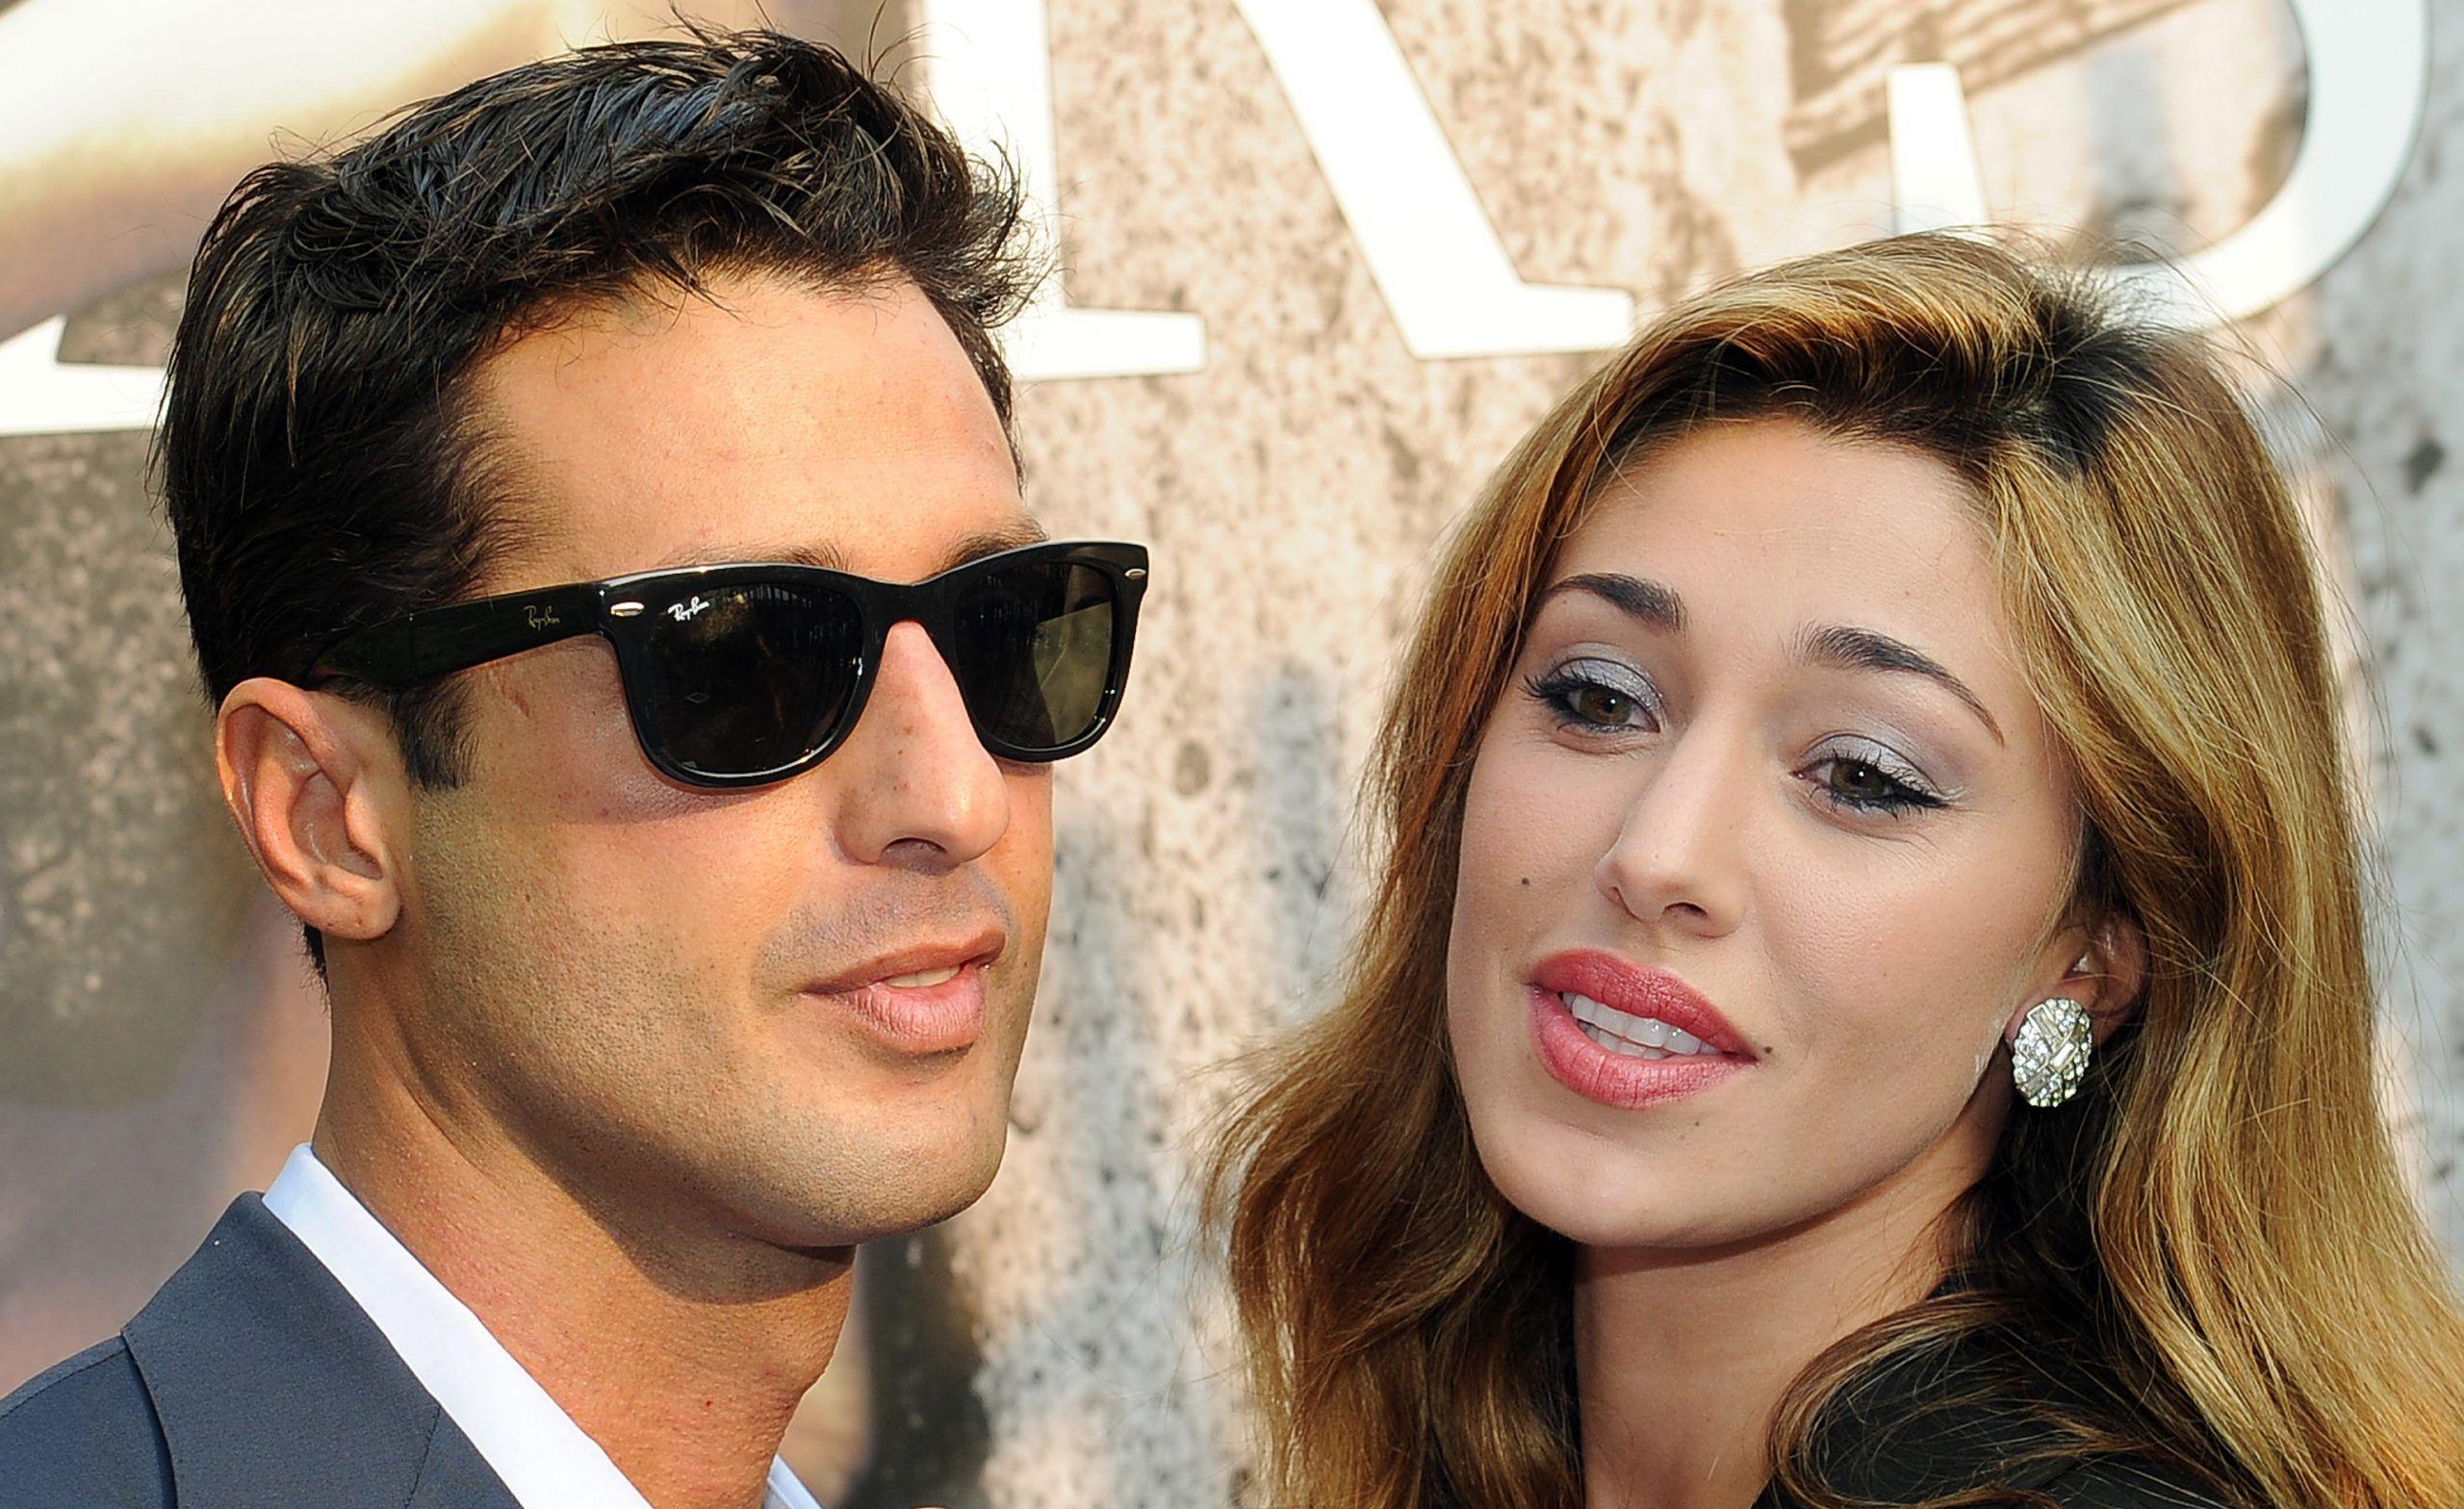 Belen Rodriguez riabbraccia Fabrizio Corona: 'A lui non rinuncio'